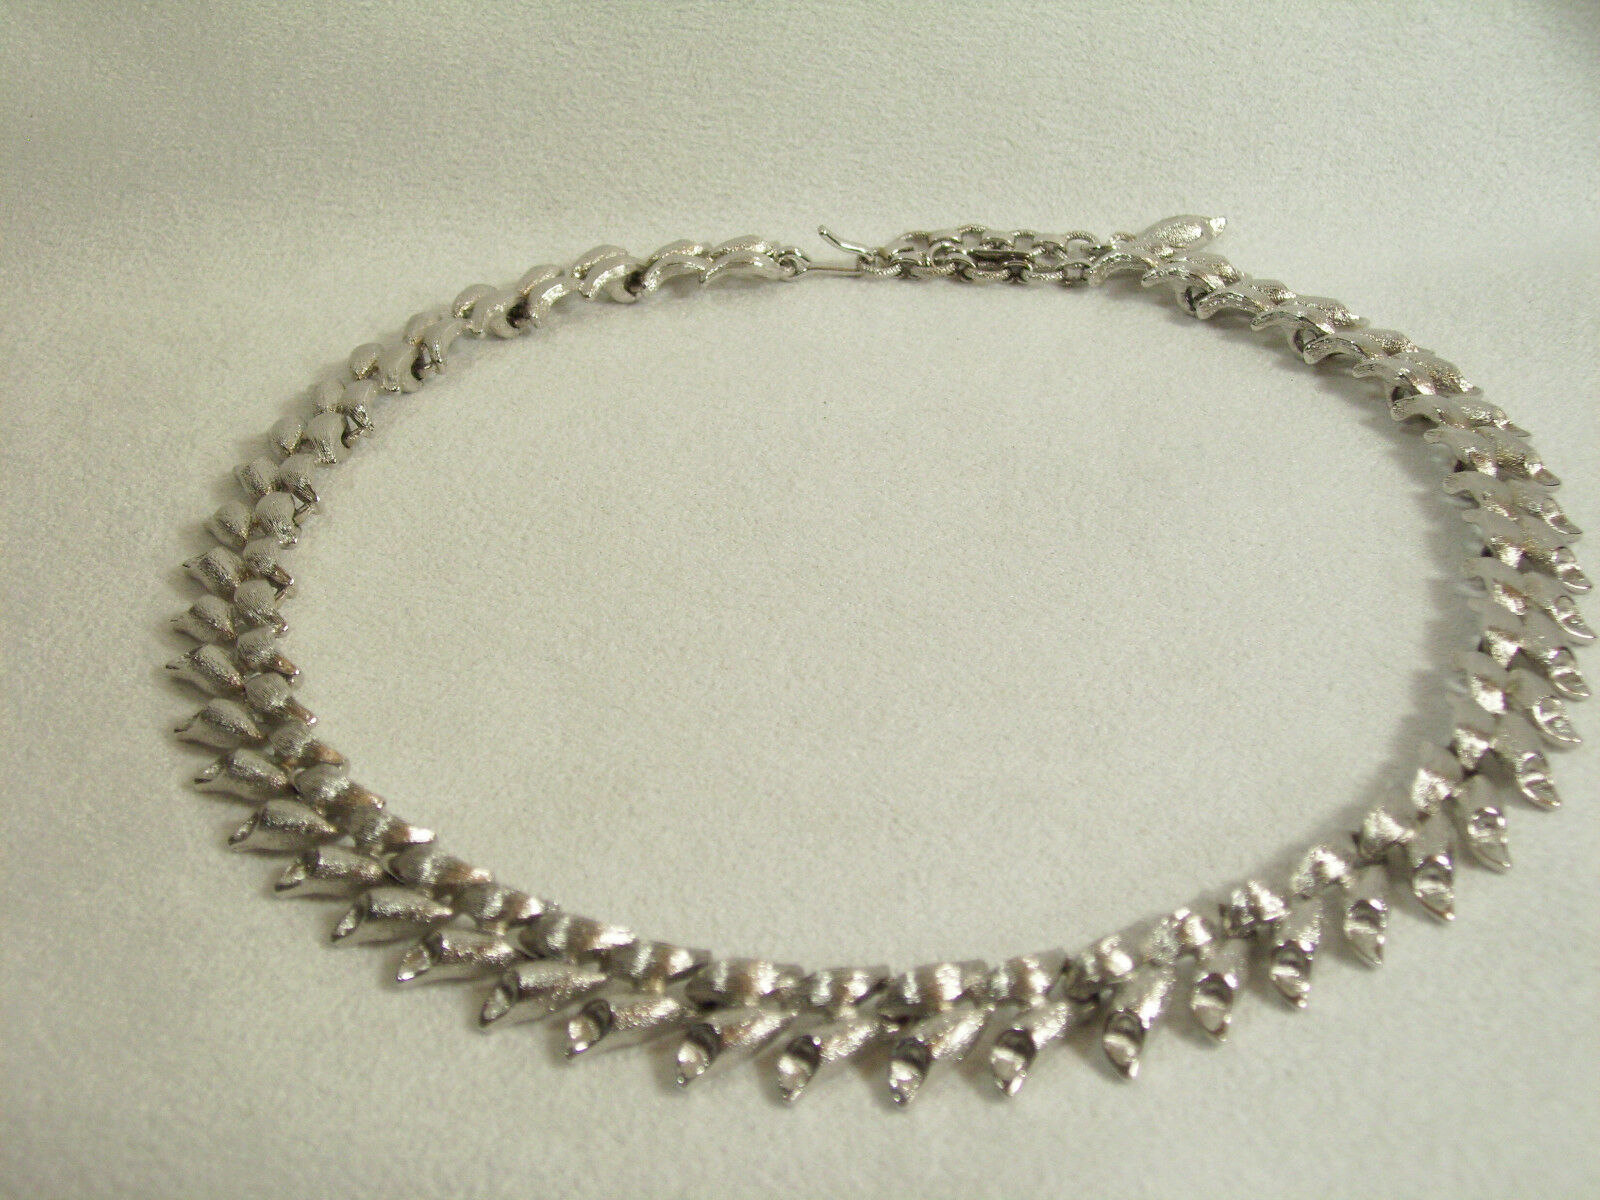 MONET Brushed SILVER Plated Link Necklace Choker Classic Vintage Estate Career